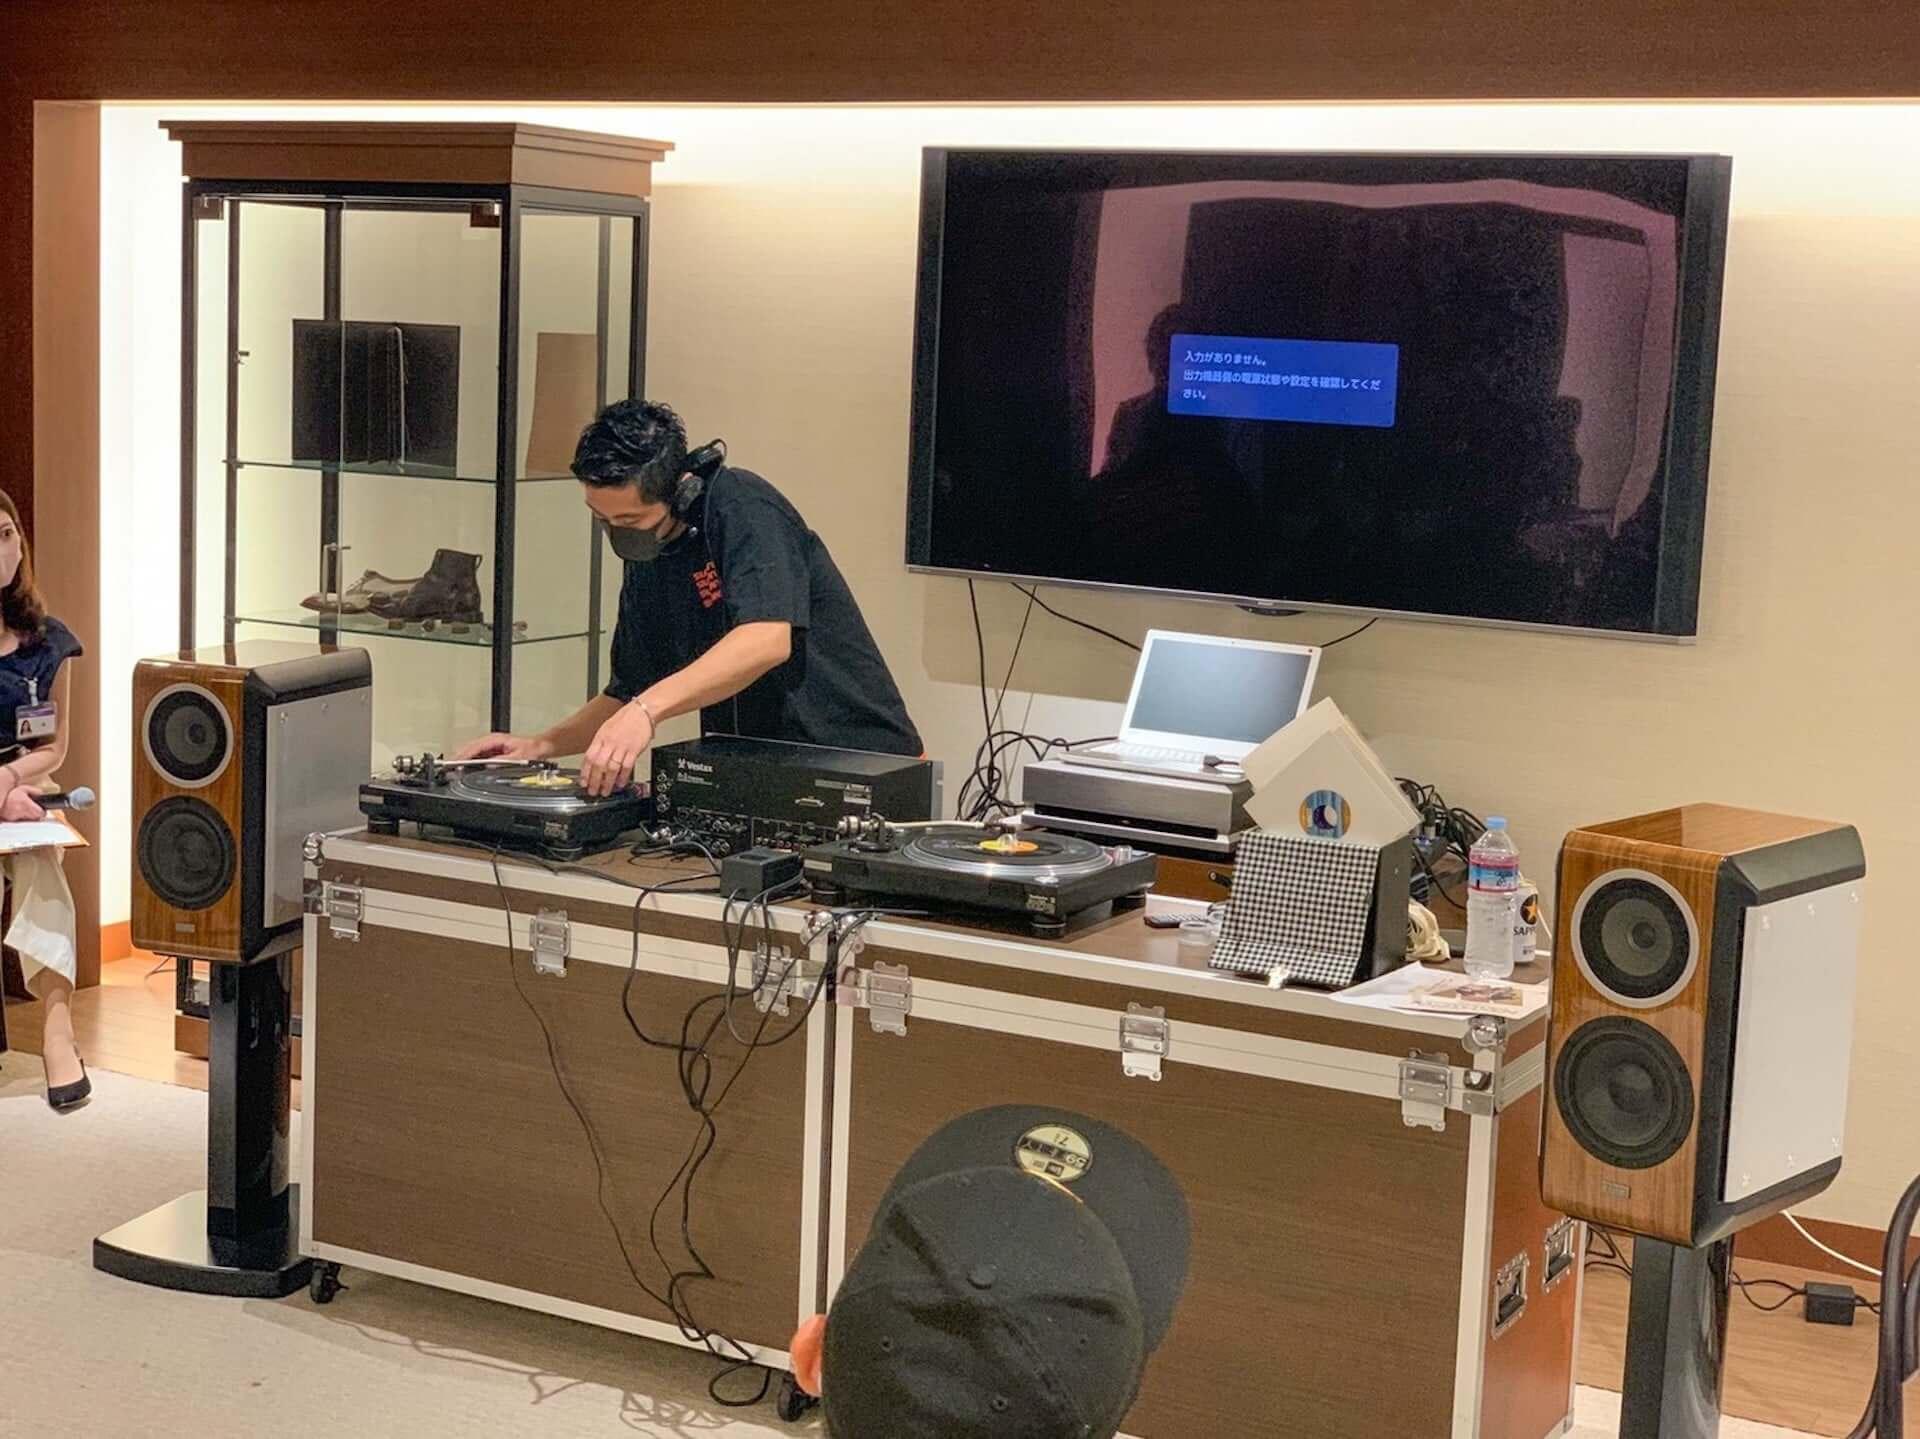 RHYMESTER・DJ JINが映画『メイキング・オブ・モータウン』の魅力を語る!ギンザレコード主催イベントのレポートが到着 film200908_makingofmotown_4-1920x1439